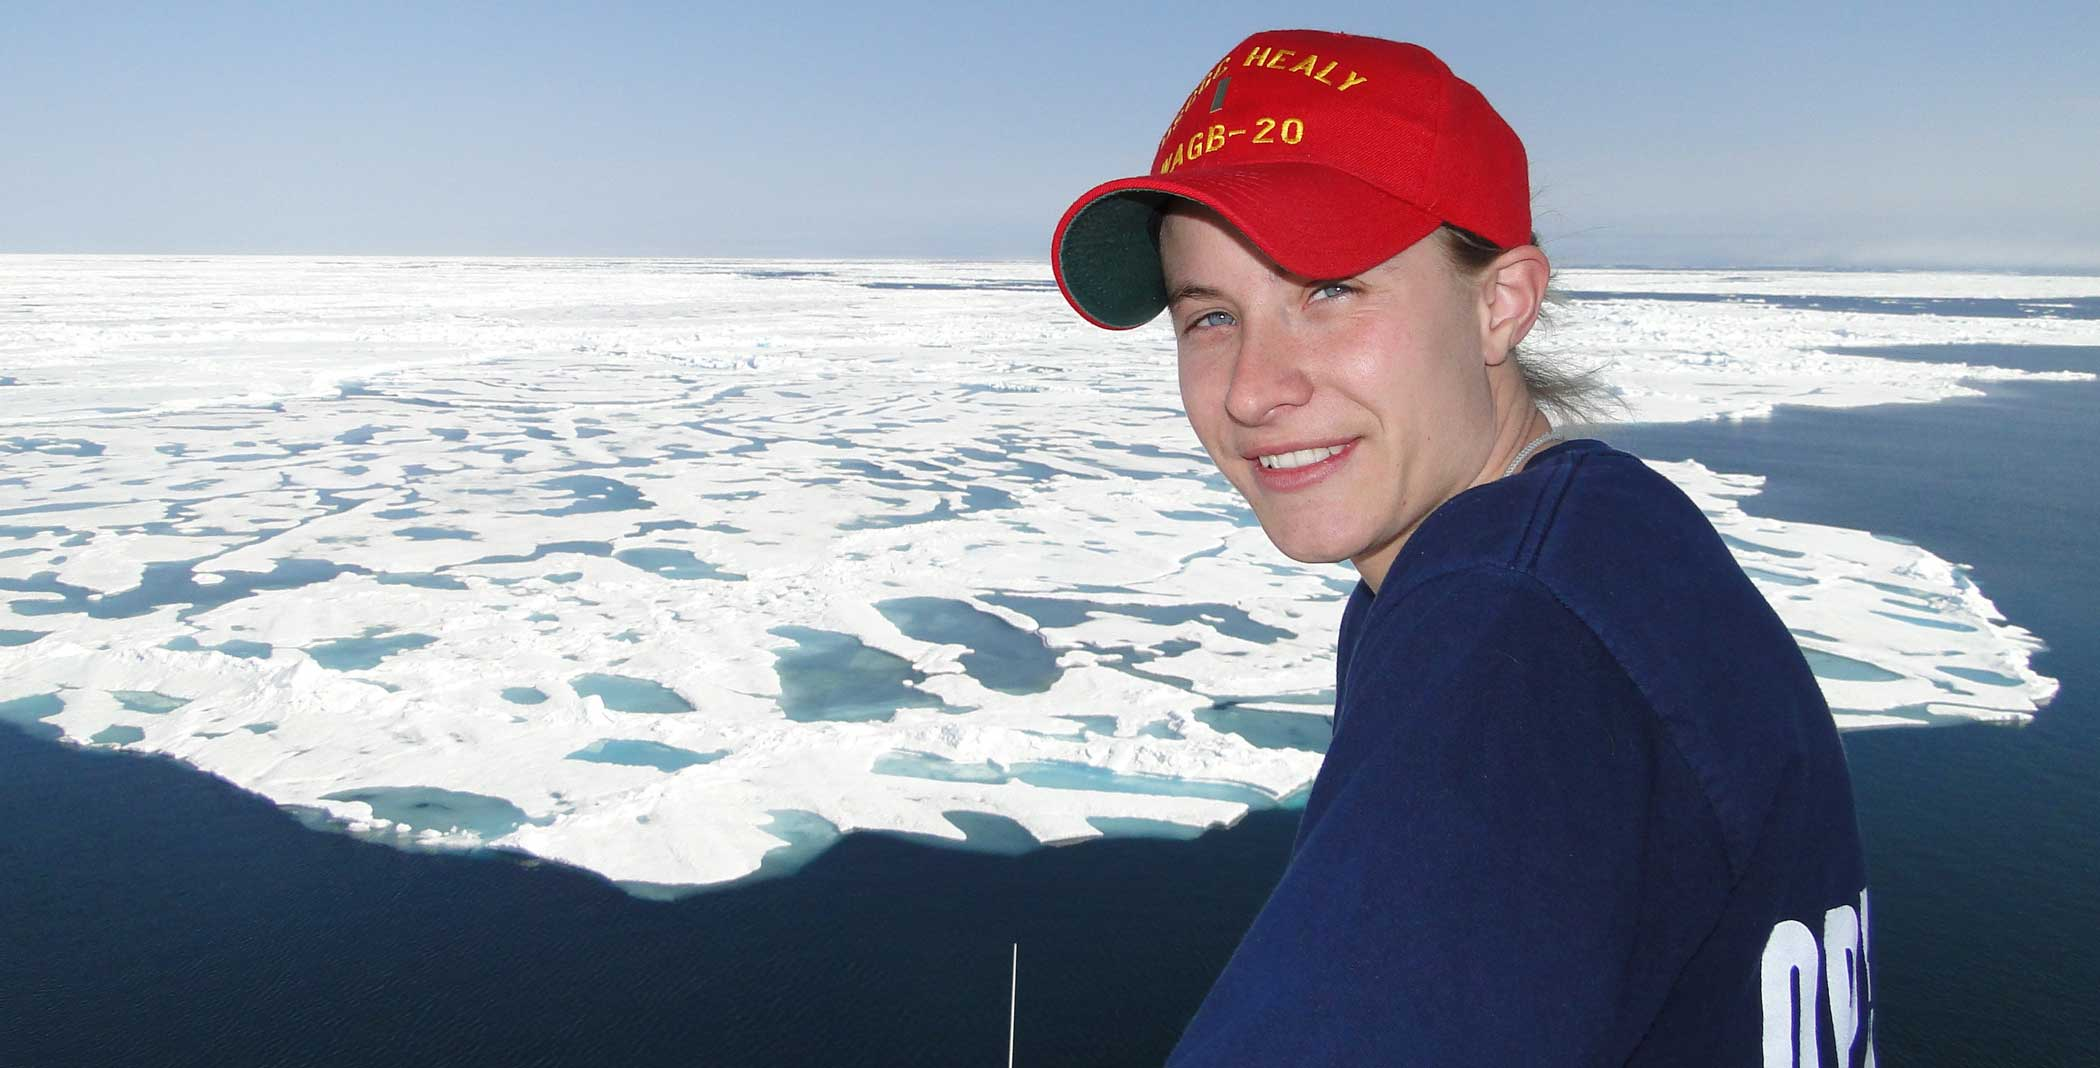 Sonner Kehrt on Healy's flying bridge, far above the Arctic Circle. Photo courtesy of author.